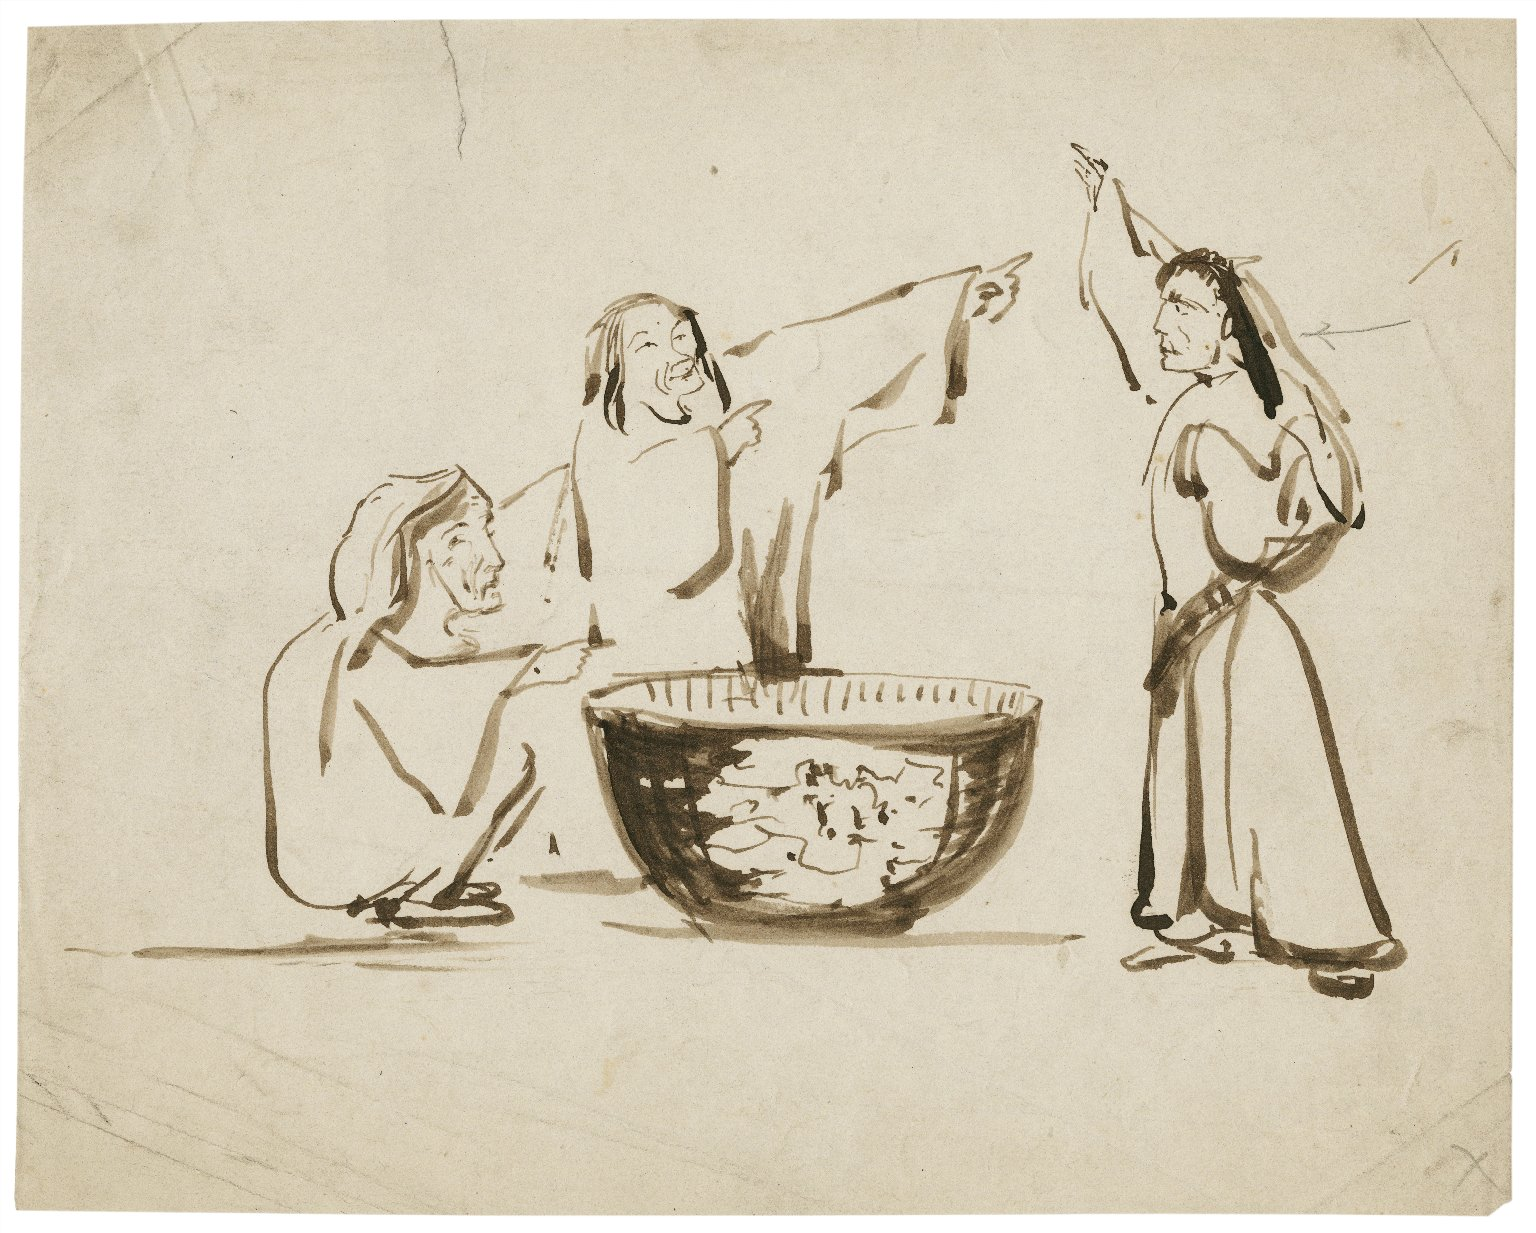 [Macbeth, the witches around their cauldron] [graphic].